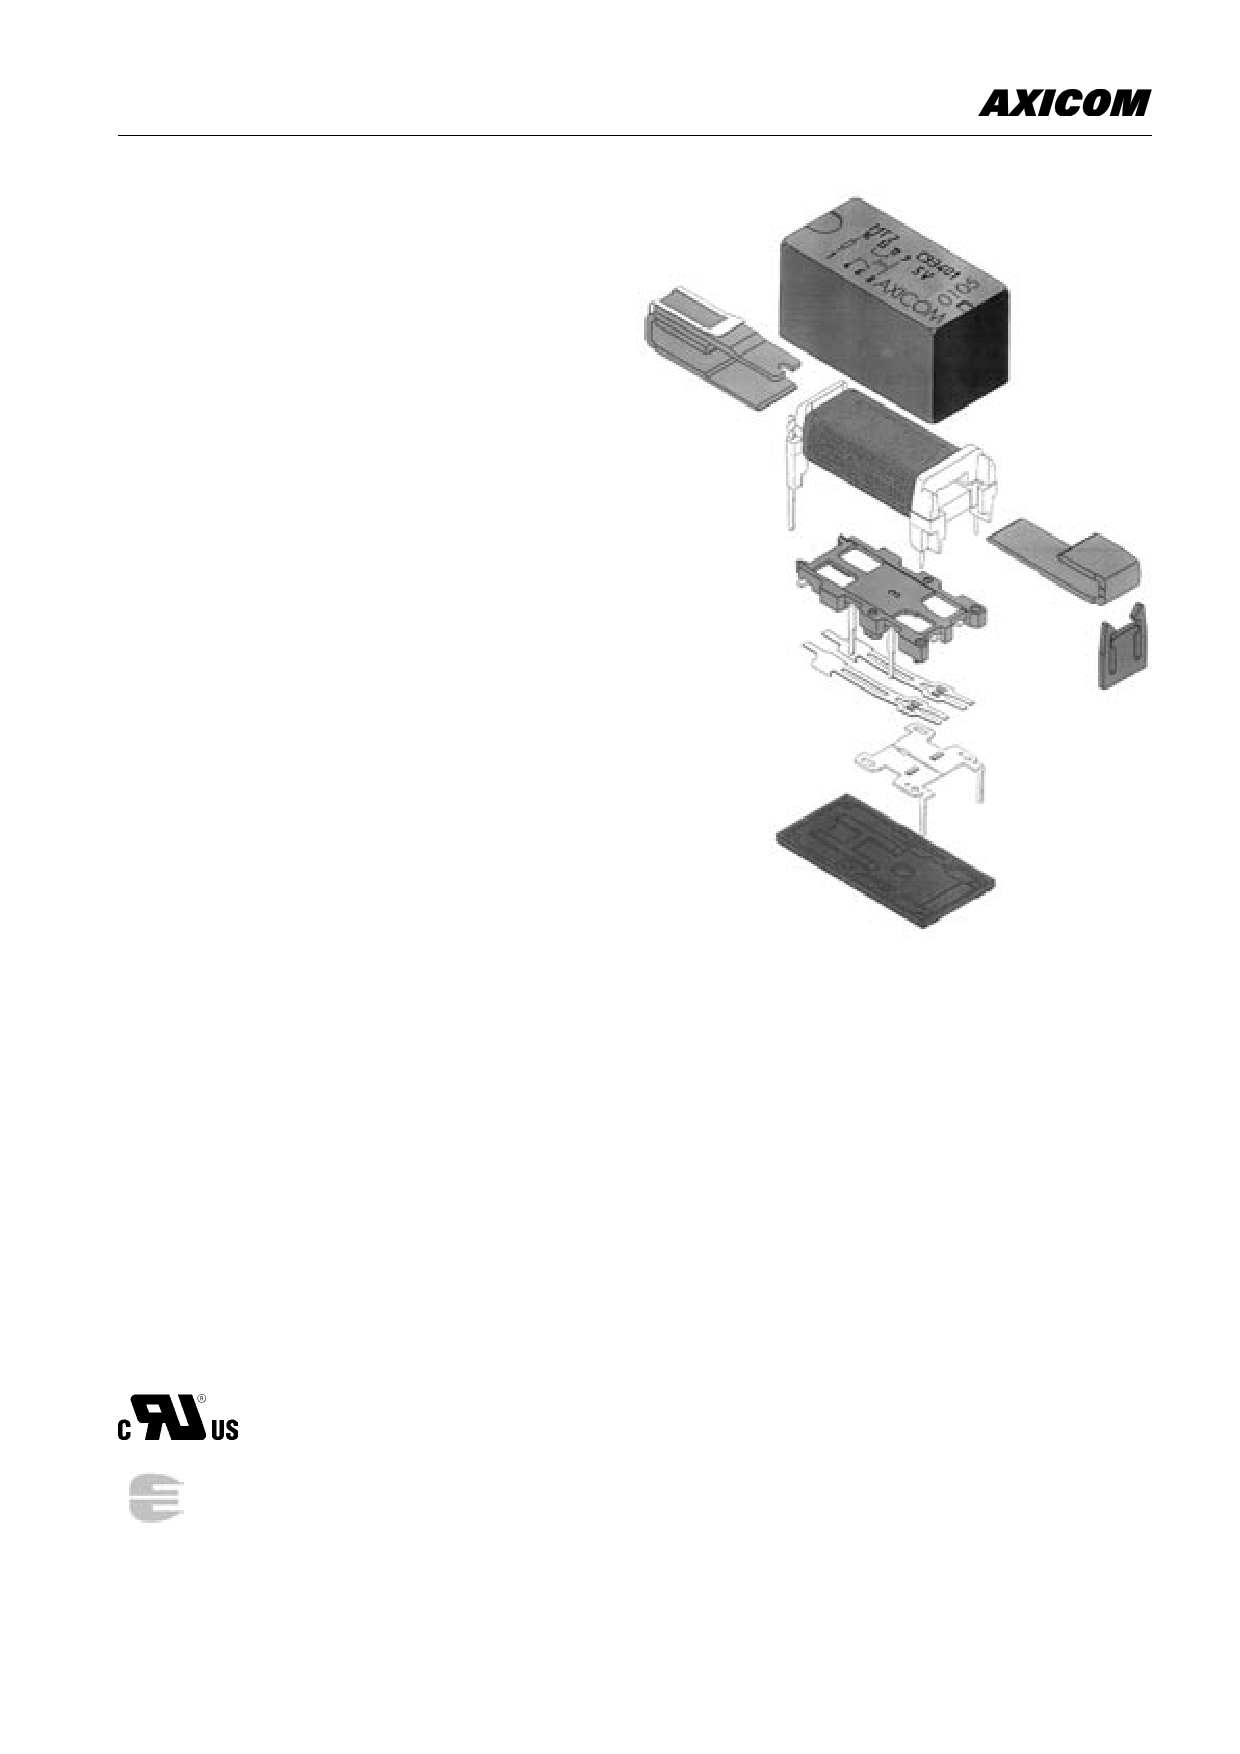 4-1462000-7 Даташит, Описание, Даташиты